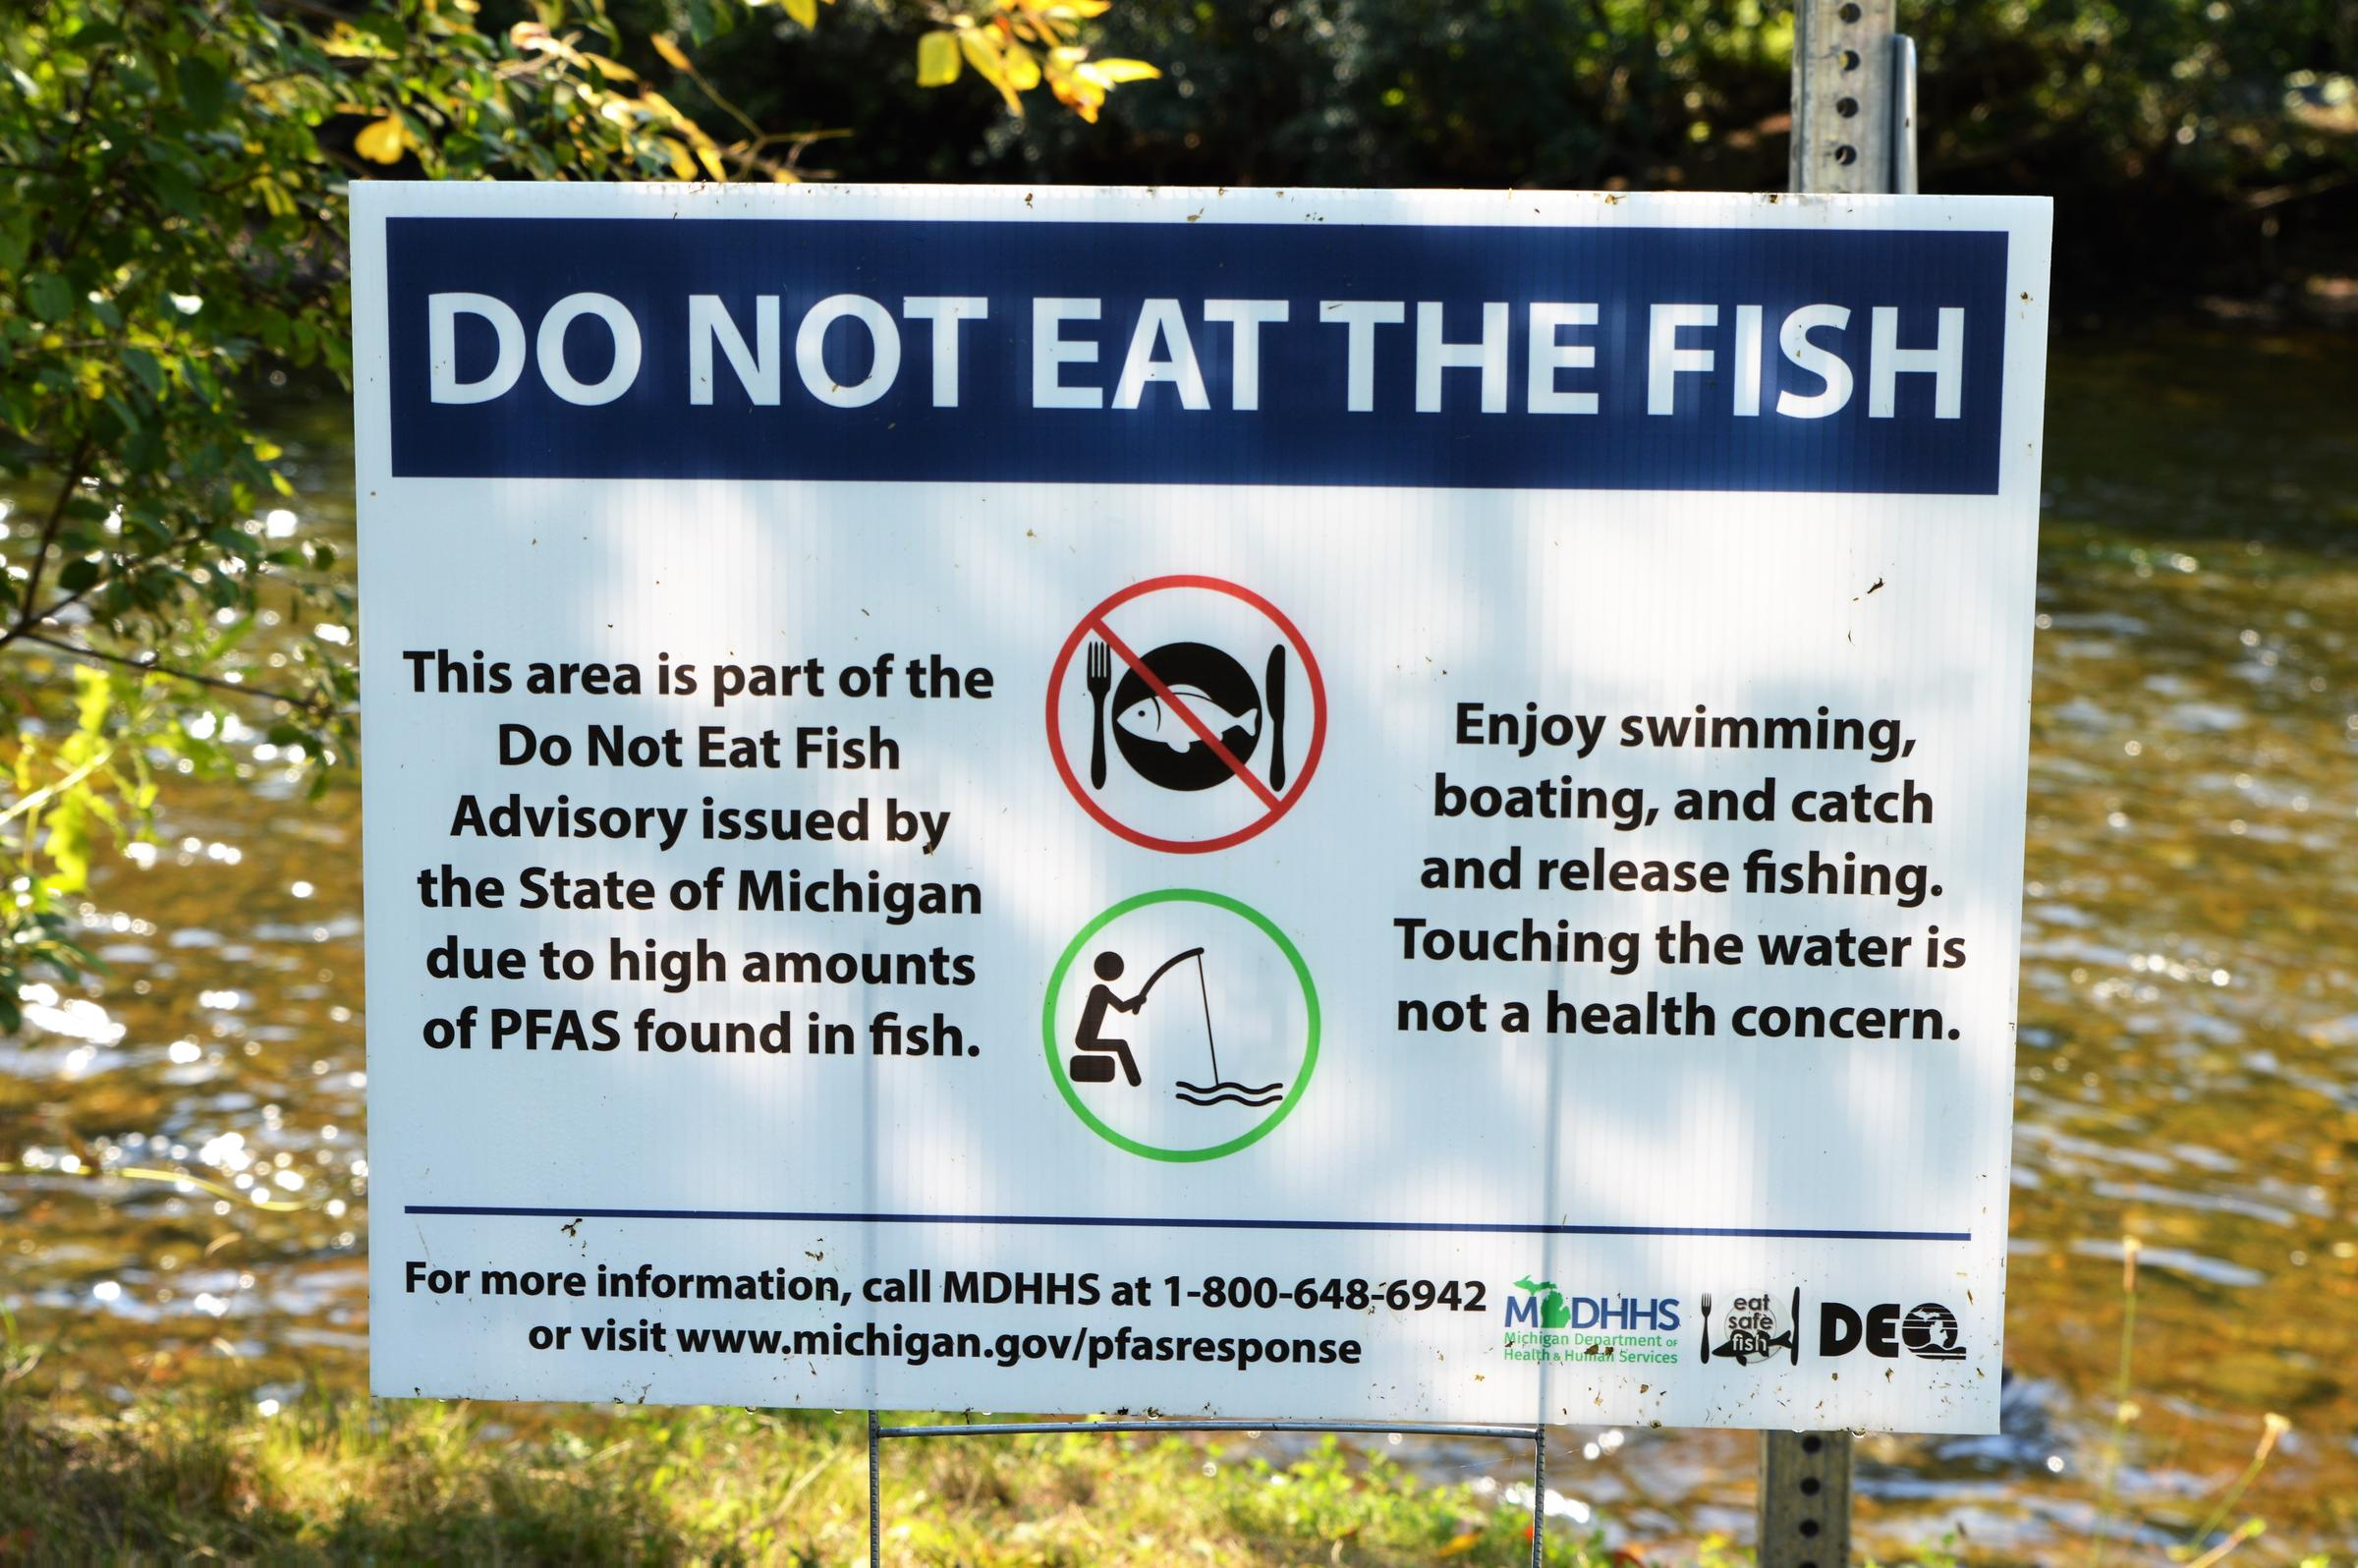 pfas causes 39 do not eat the fish 39 advisories michigan radio. Black Bedroom Furniture Sets. Home Design Ideas